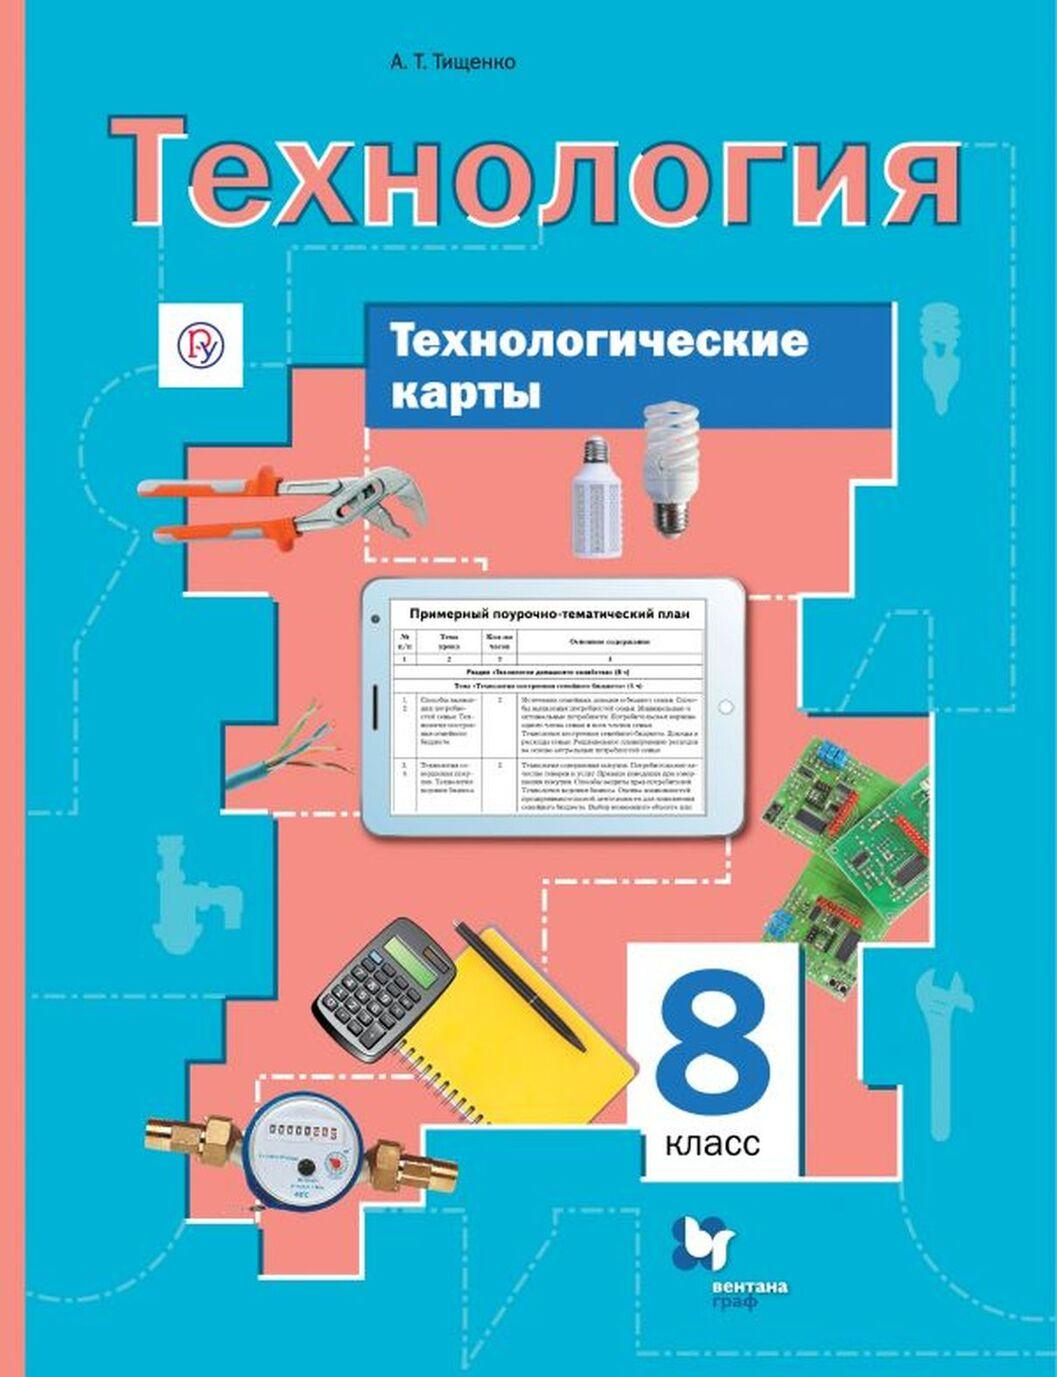 Tekhnologija. 8 klass. Tekhnologicheskie karty | Tischenko Aleksej Timofeevich